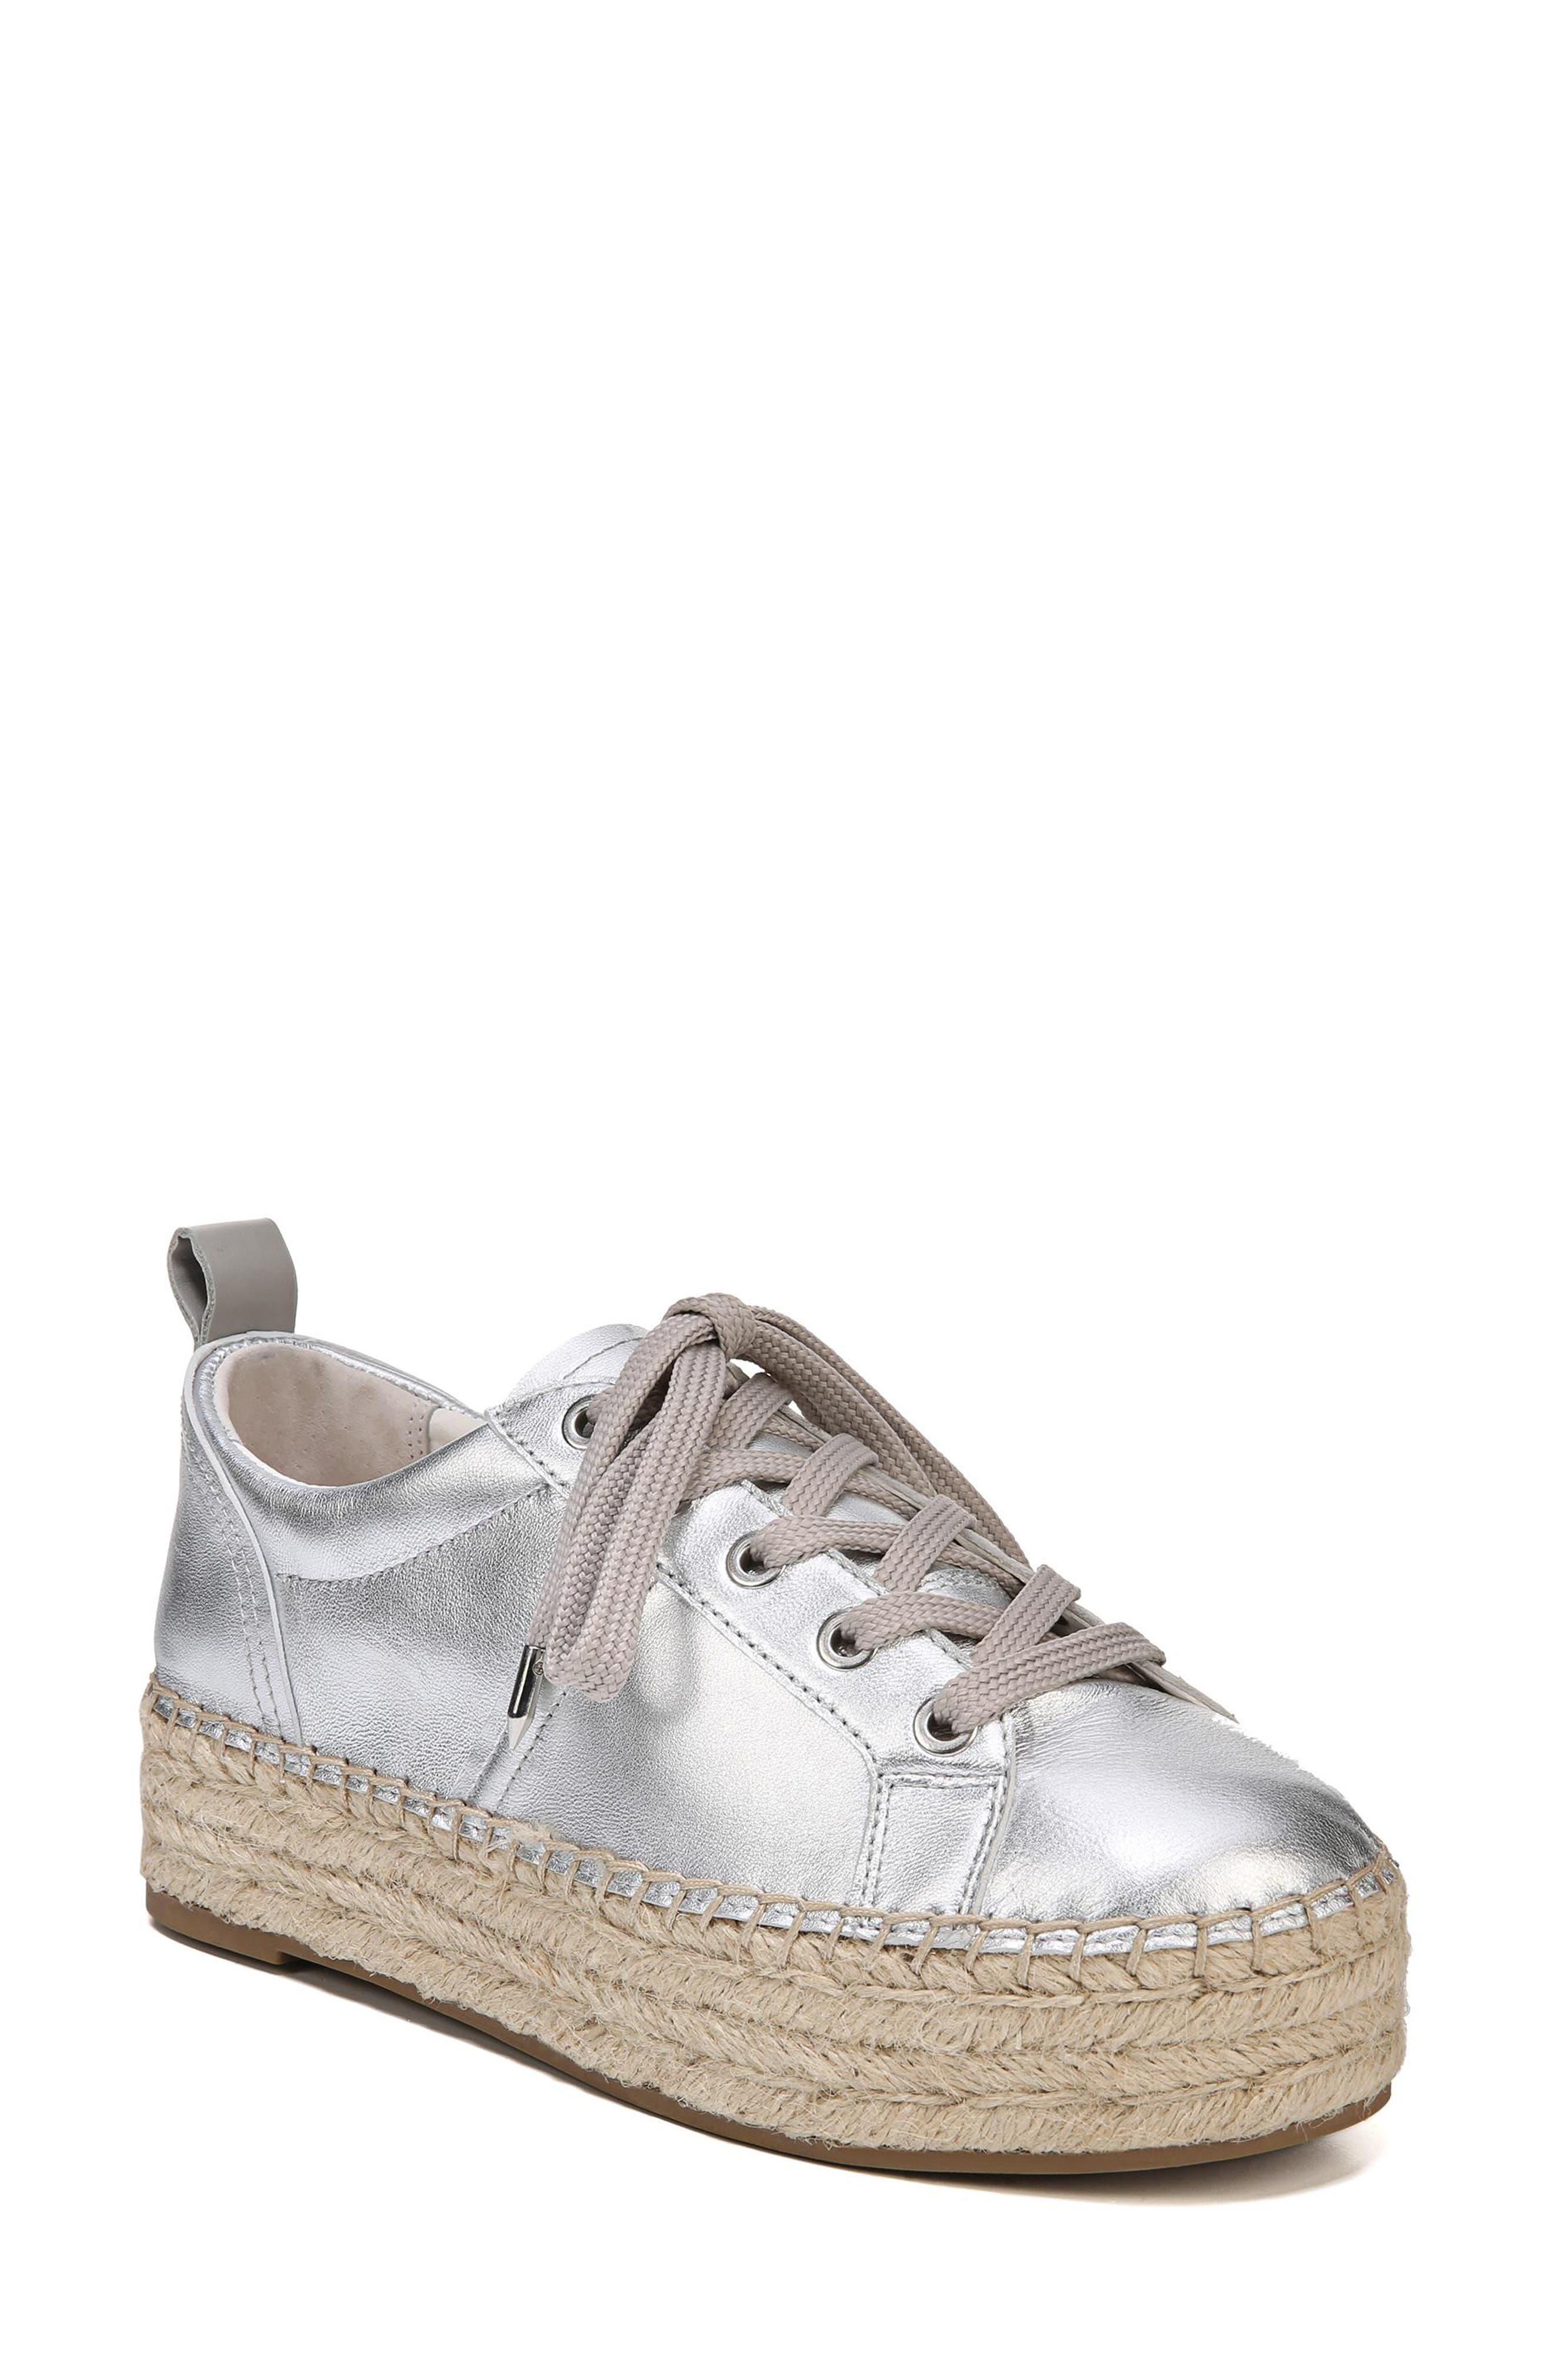 Carleigh Espadrille Sneaker,                             Main thumbnail 1, color,                             040